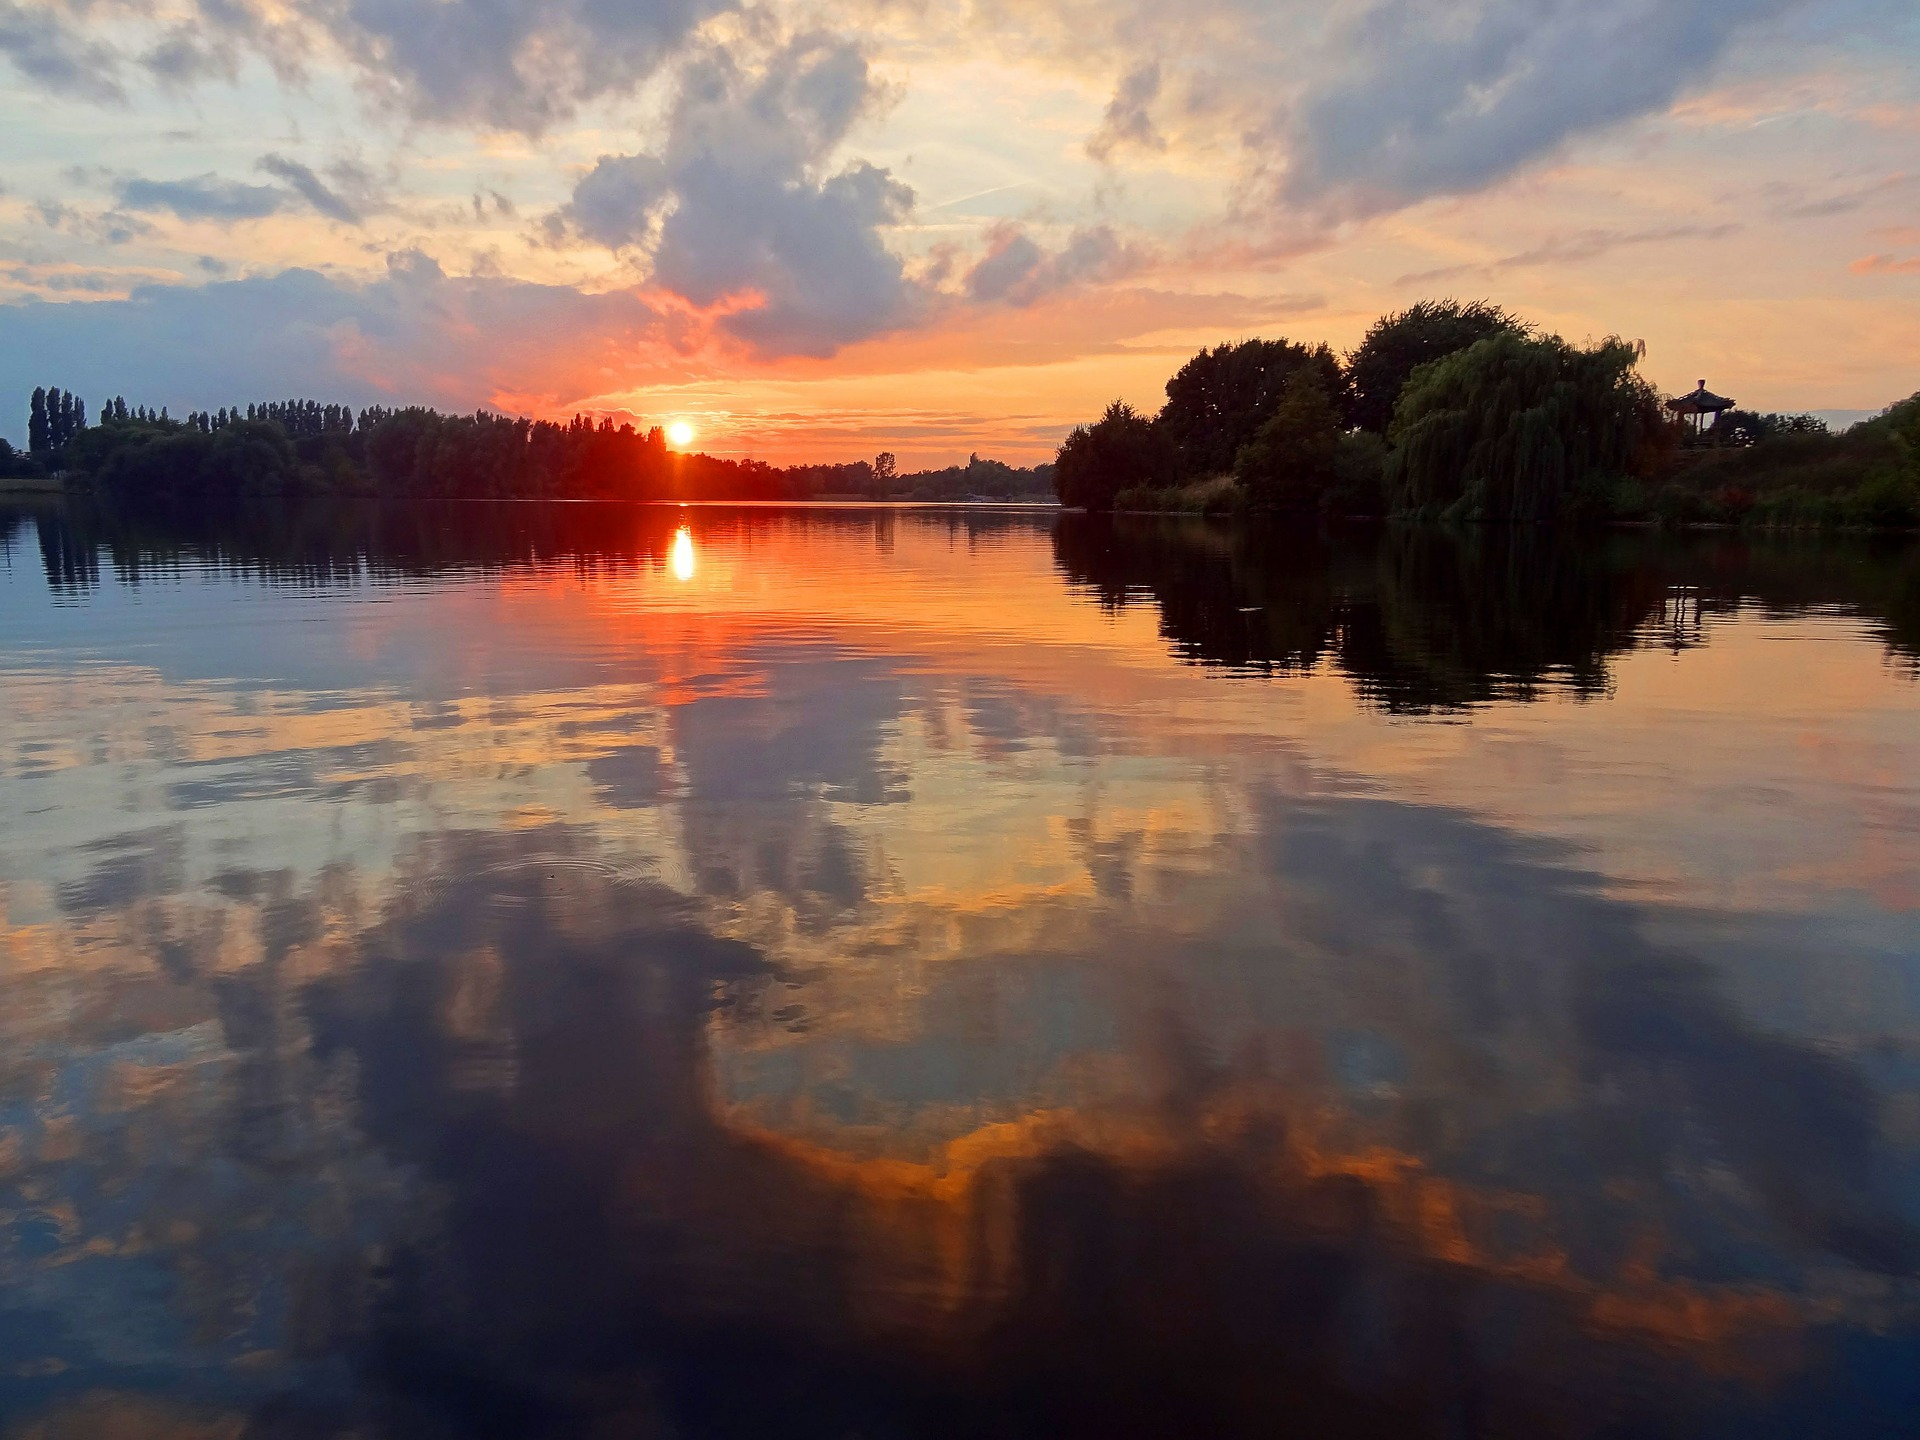 sunset-549677_1920